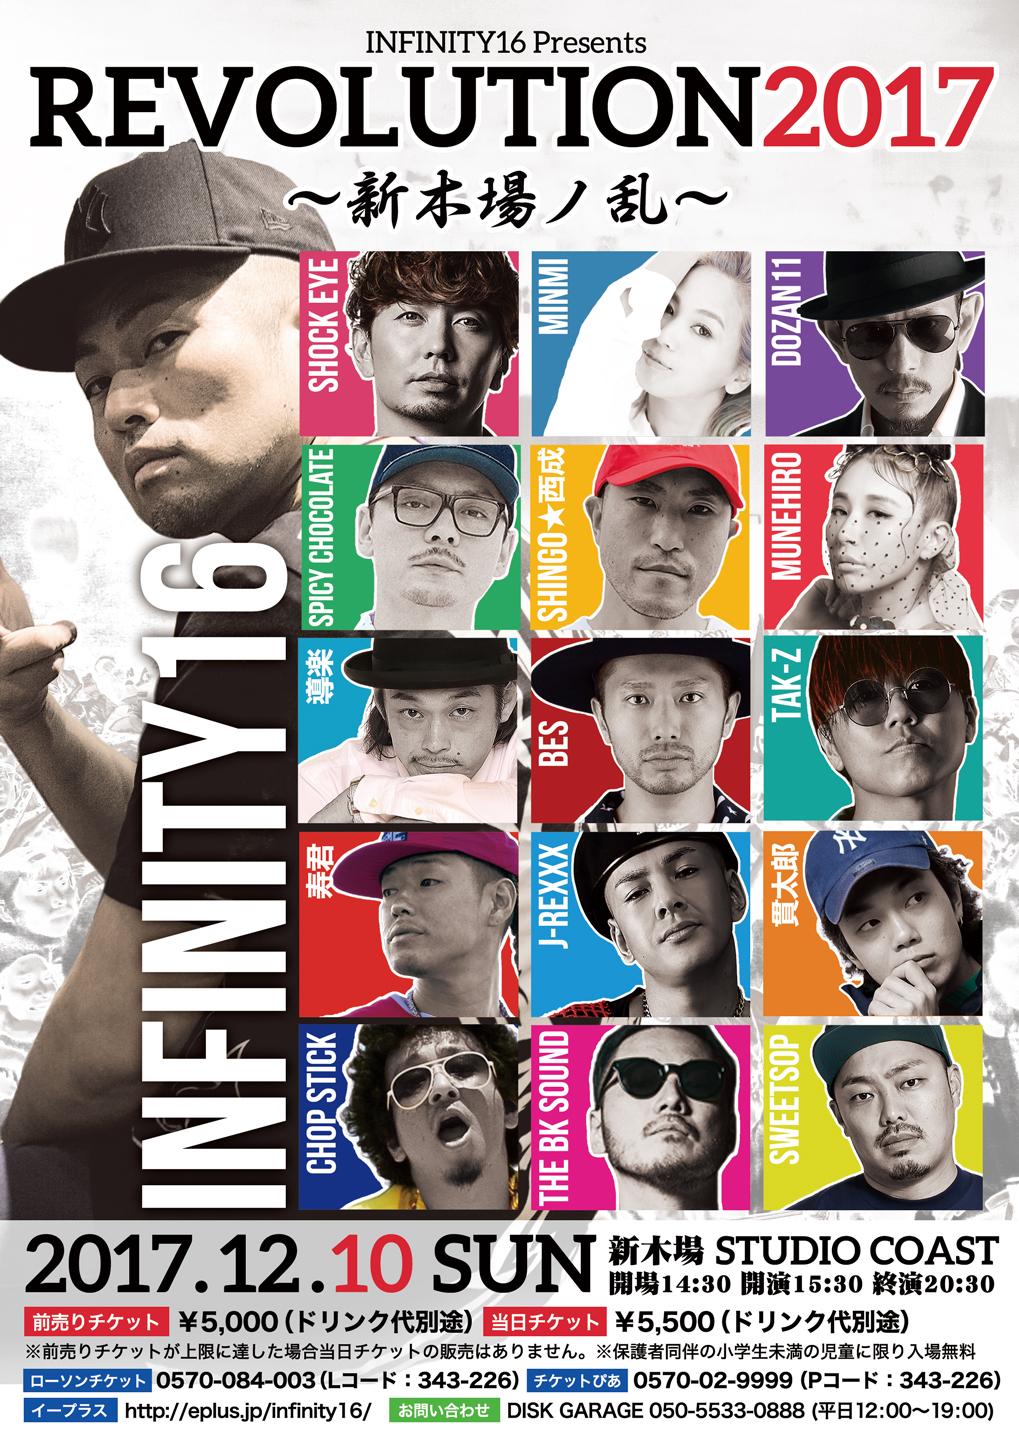 INFINITY16 Presents REVOLUTION 2017 〜新木場ノ乱〜